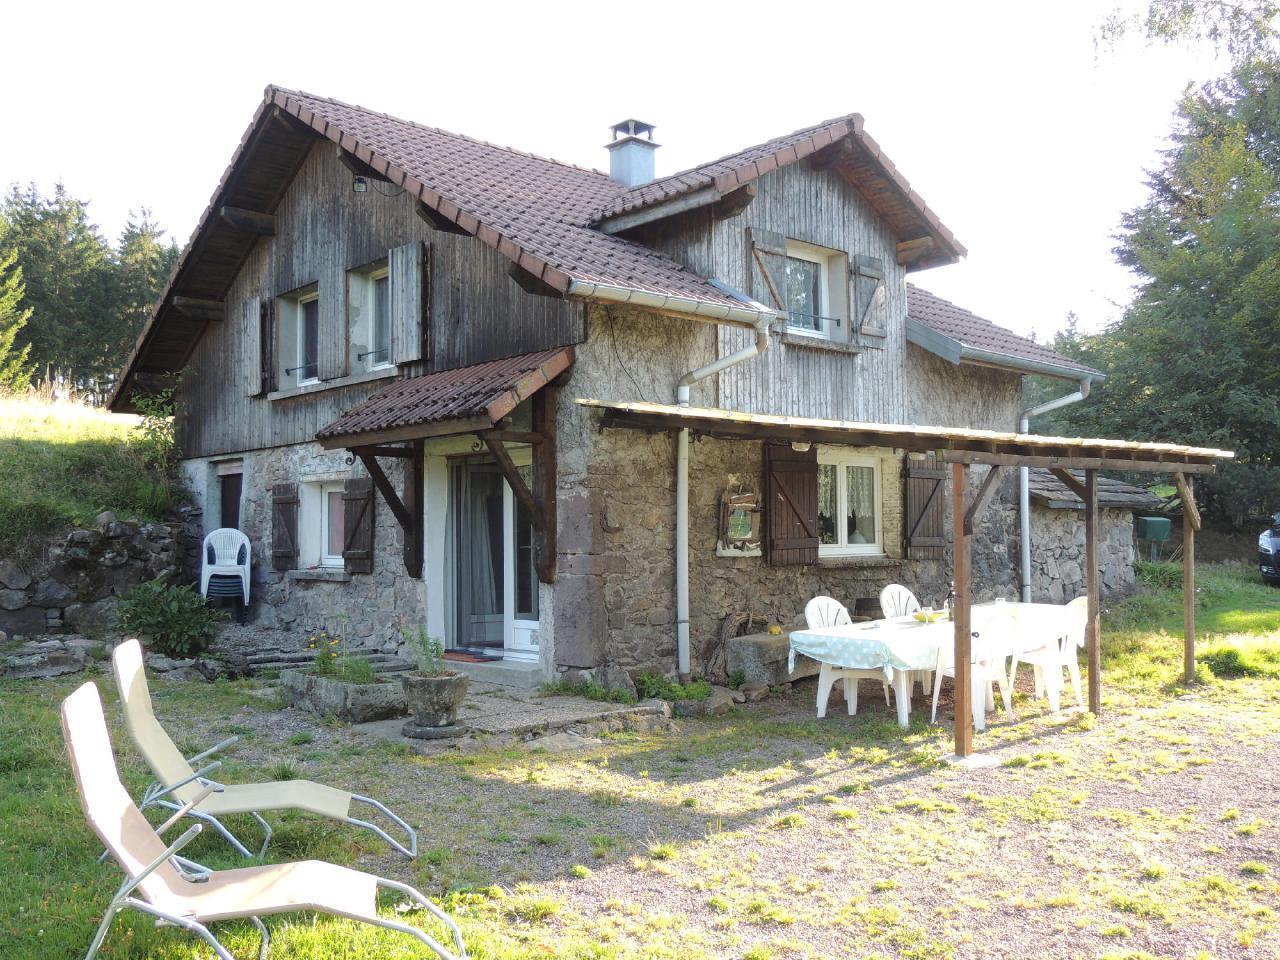 Ferienhaus Steinhäuschen Shila, im Naturparc der Vogesen,  mit Saunahaus (1717460), La Rosière, Haute-Saône, Franche-Comté, Frankreich, Bild 1